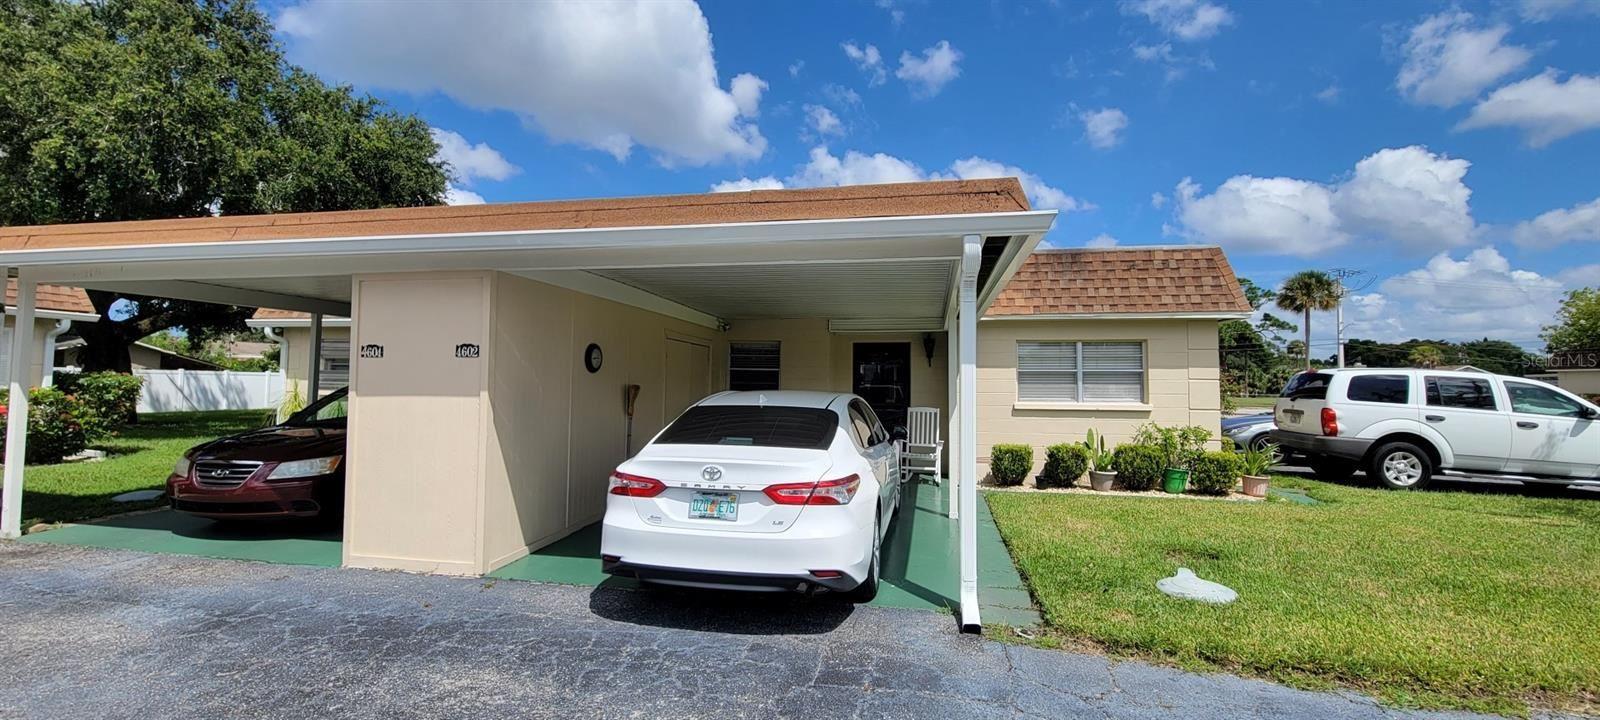 4602 PARK ACRES DRIVE, Bradenton, FL 34207 - #: A4512193